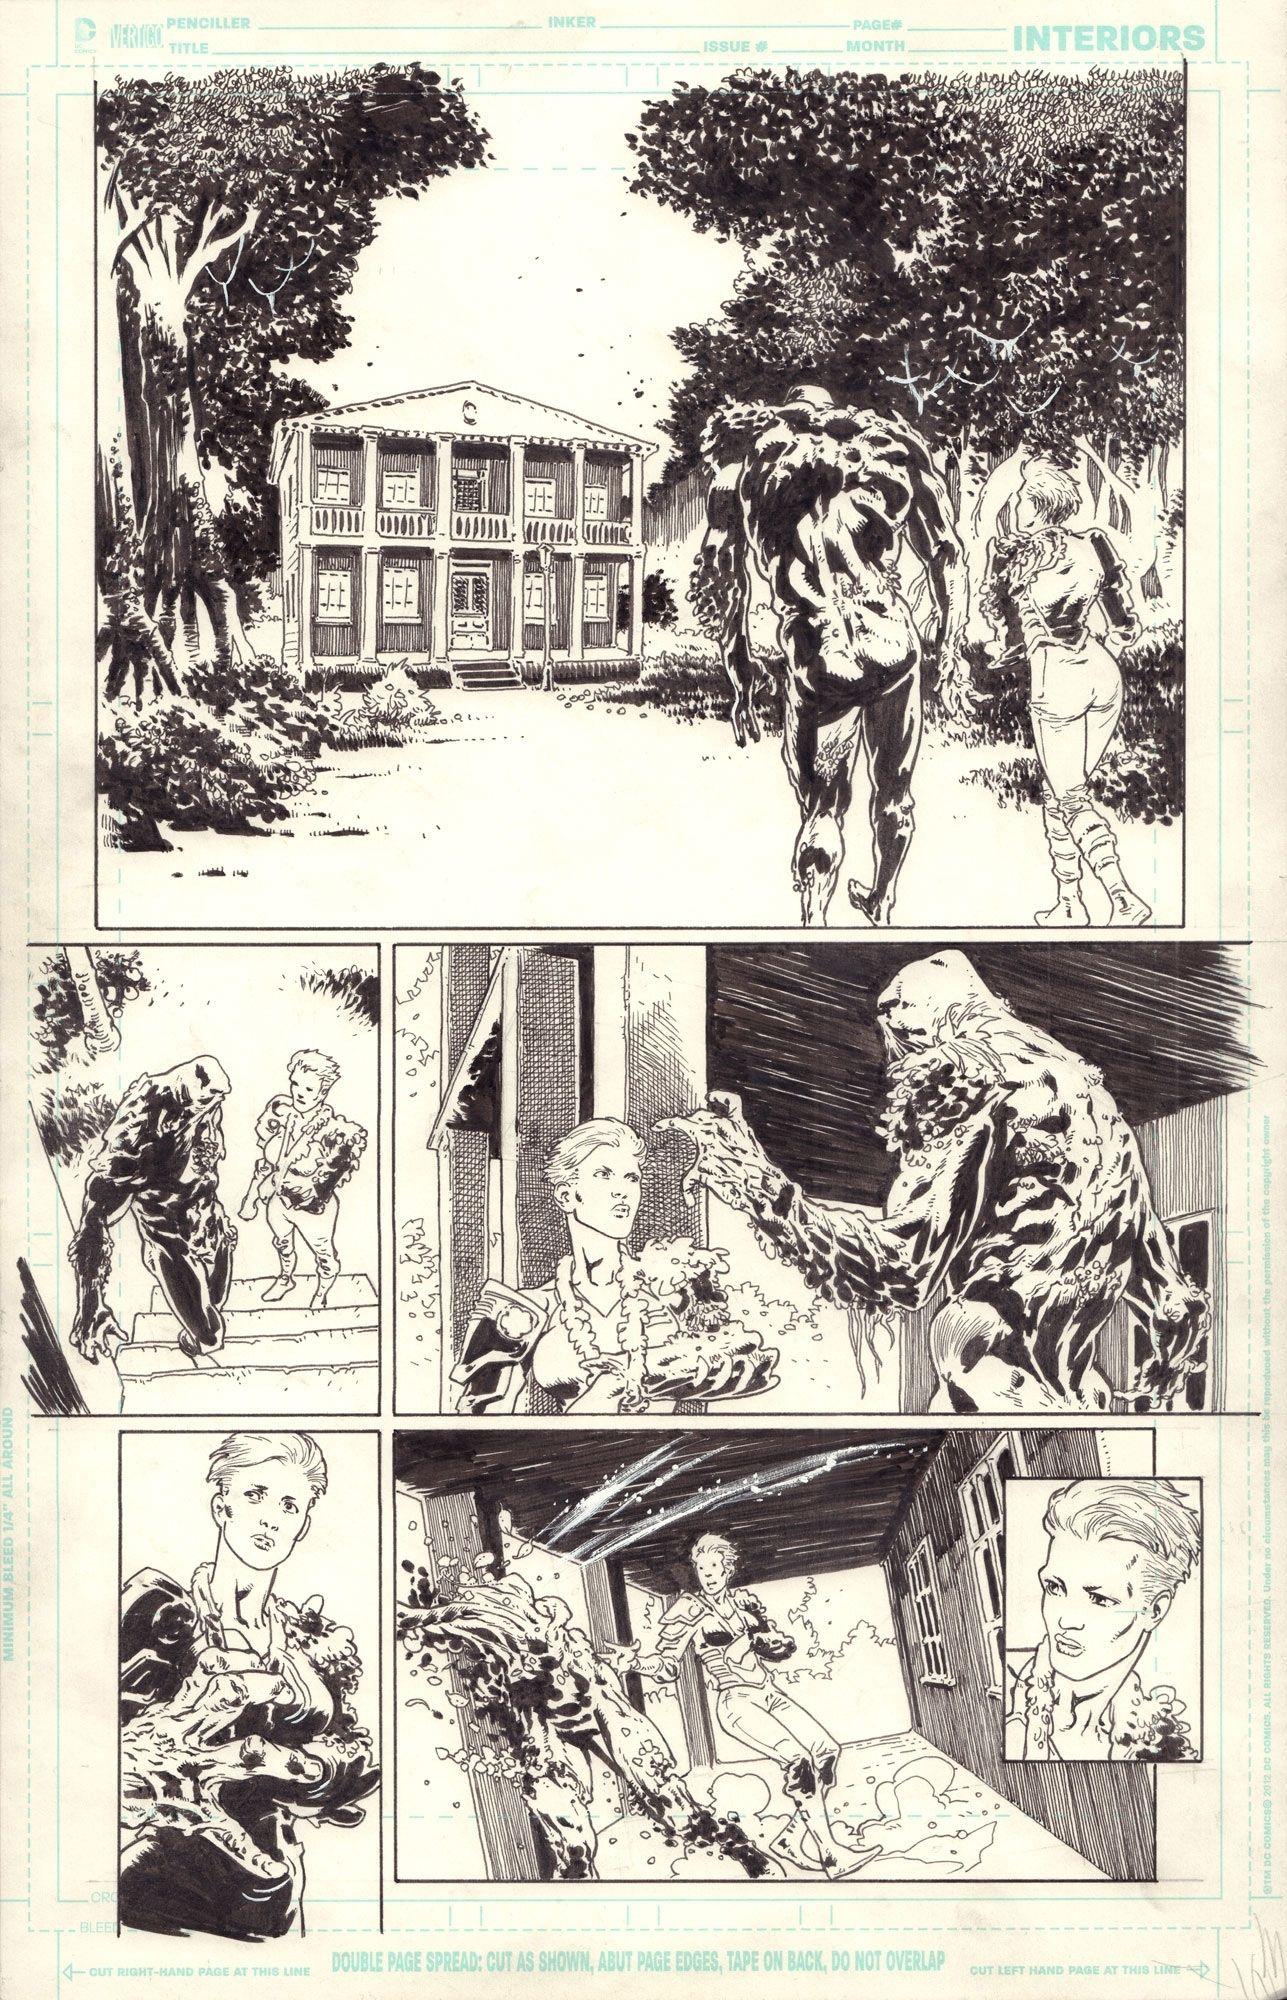 Swamp Thing vol 4 #24 / 5